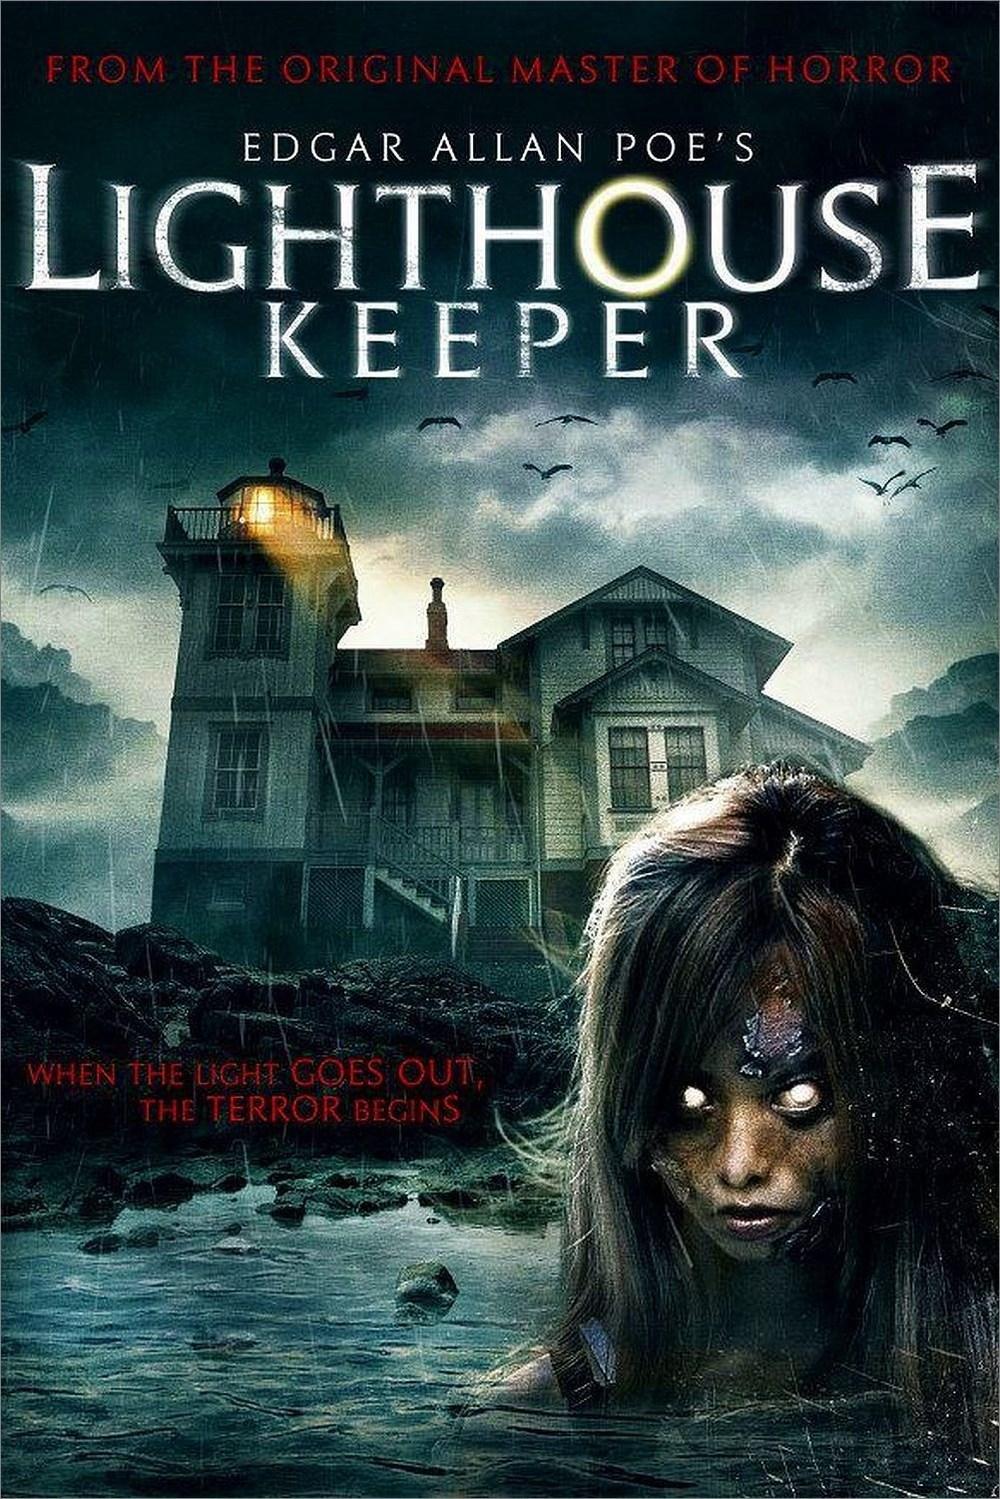 affiche du film Edgar Allan Poe's Lighthouse Keeper